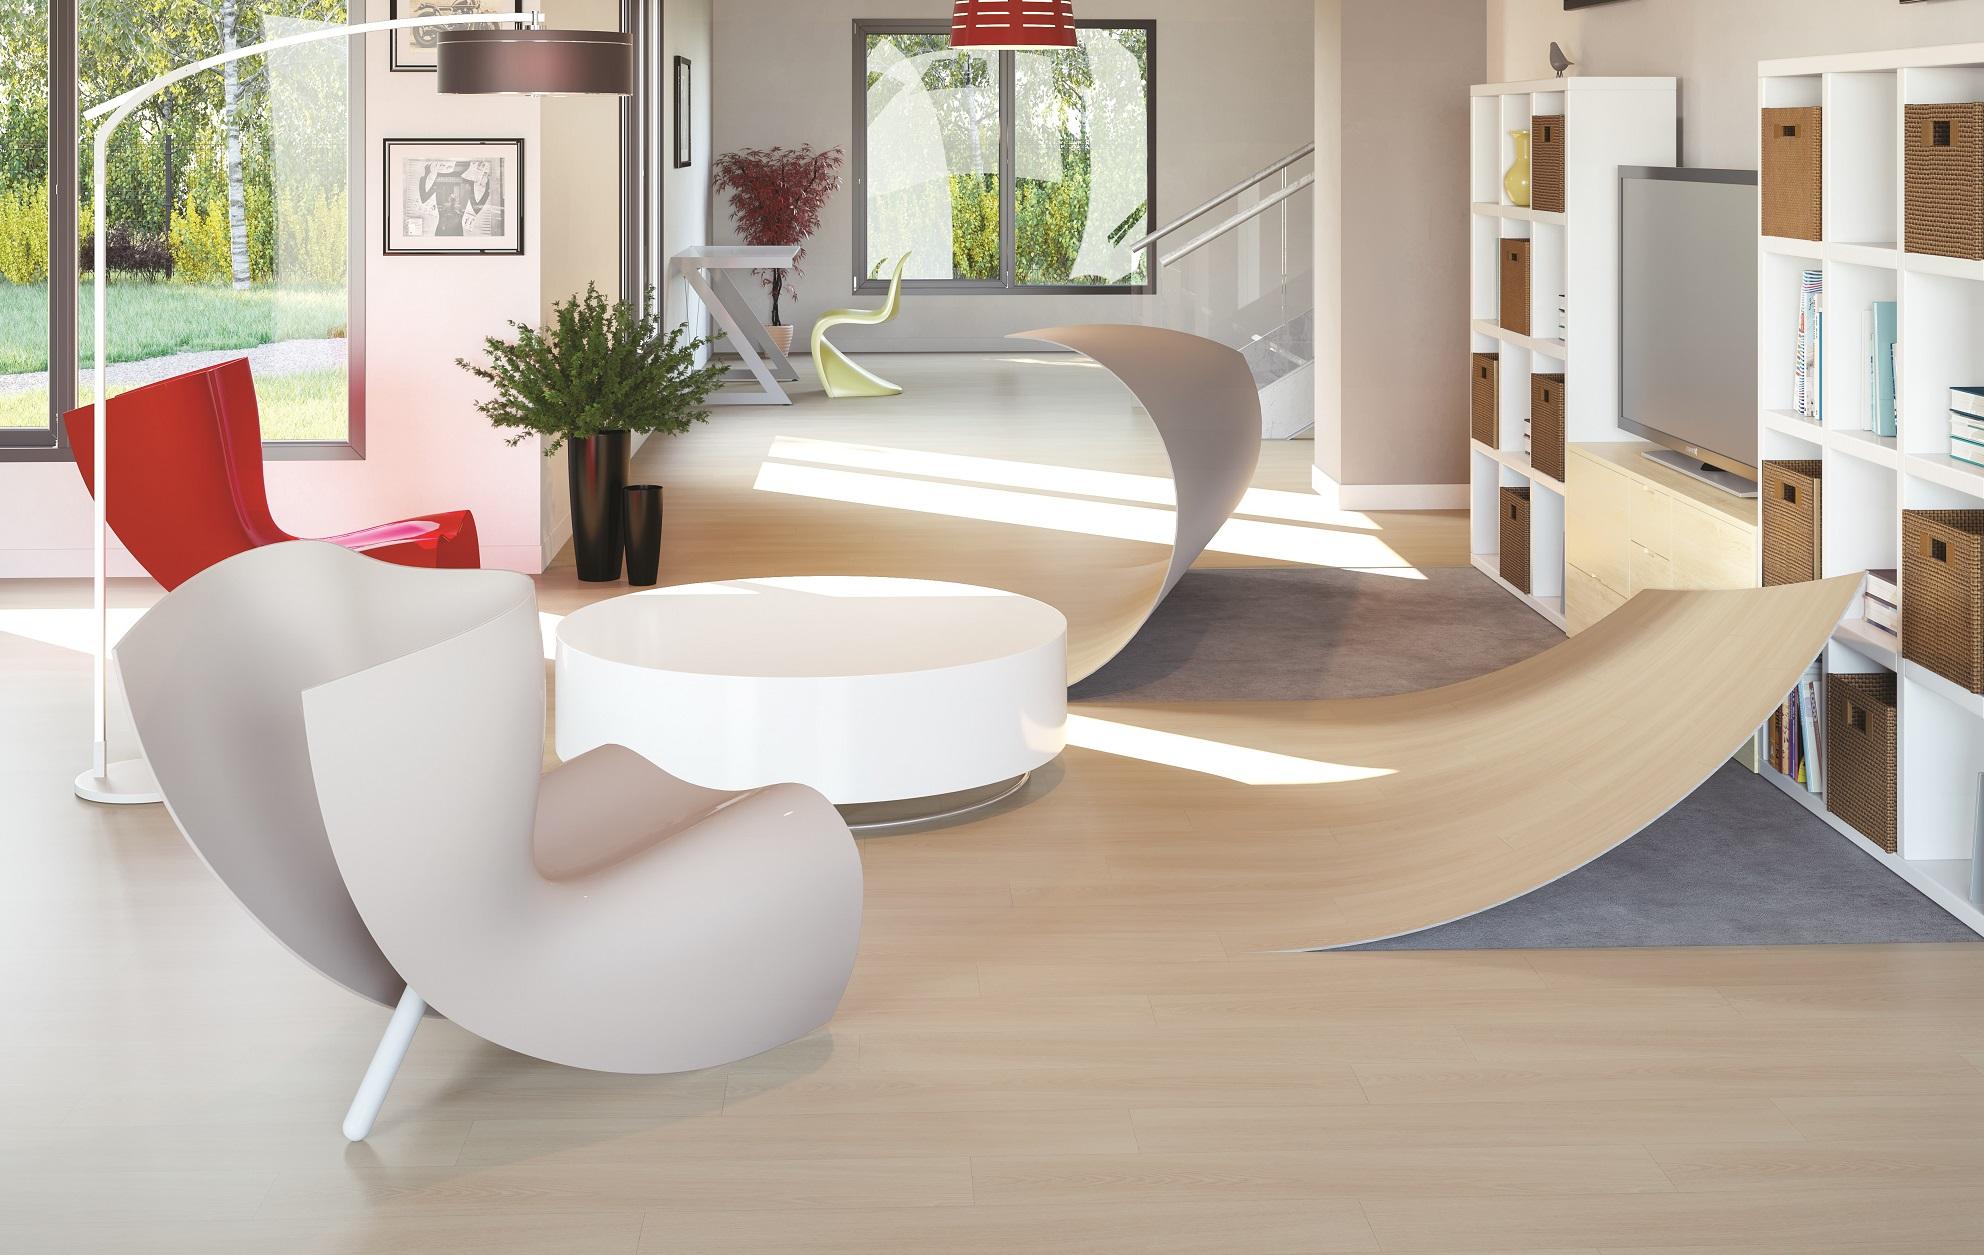 modul up le sol qui se pose sans colle. Black Bedroom Furniture Sets. Home Design Ideas